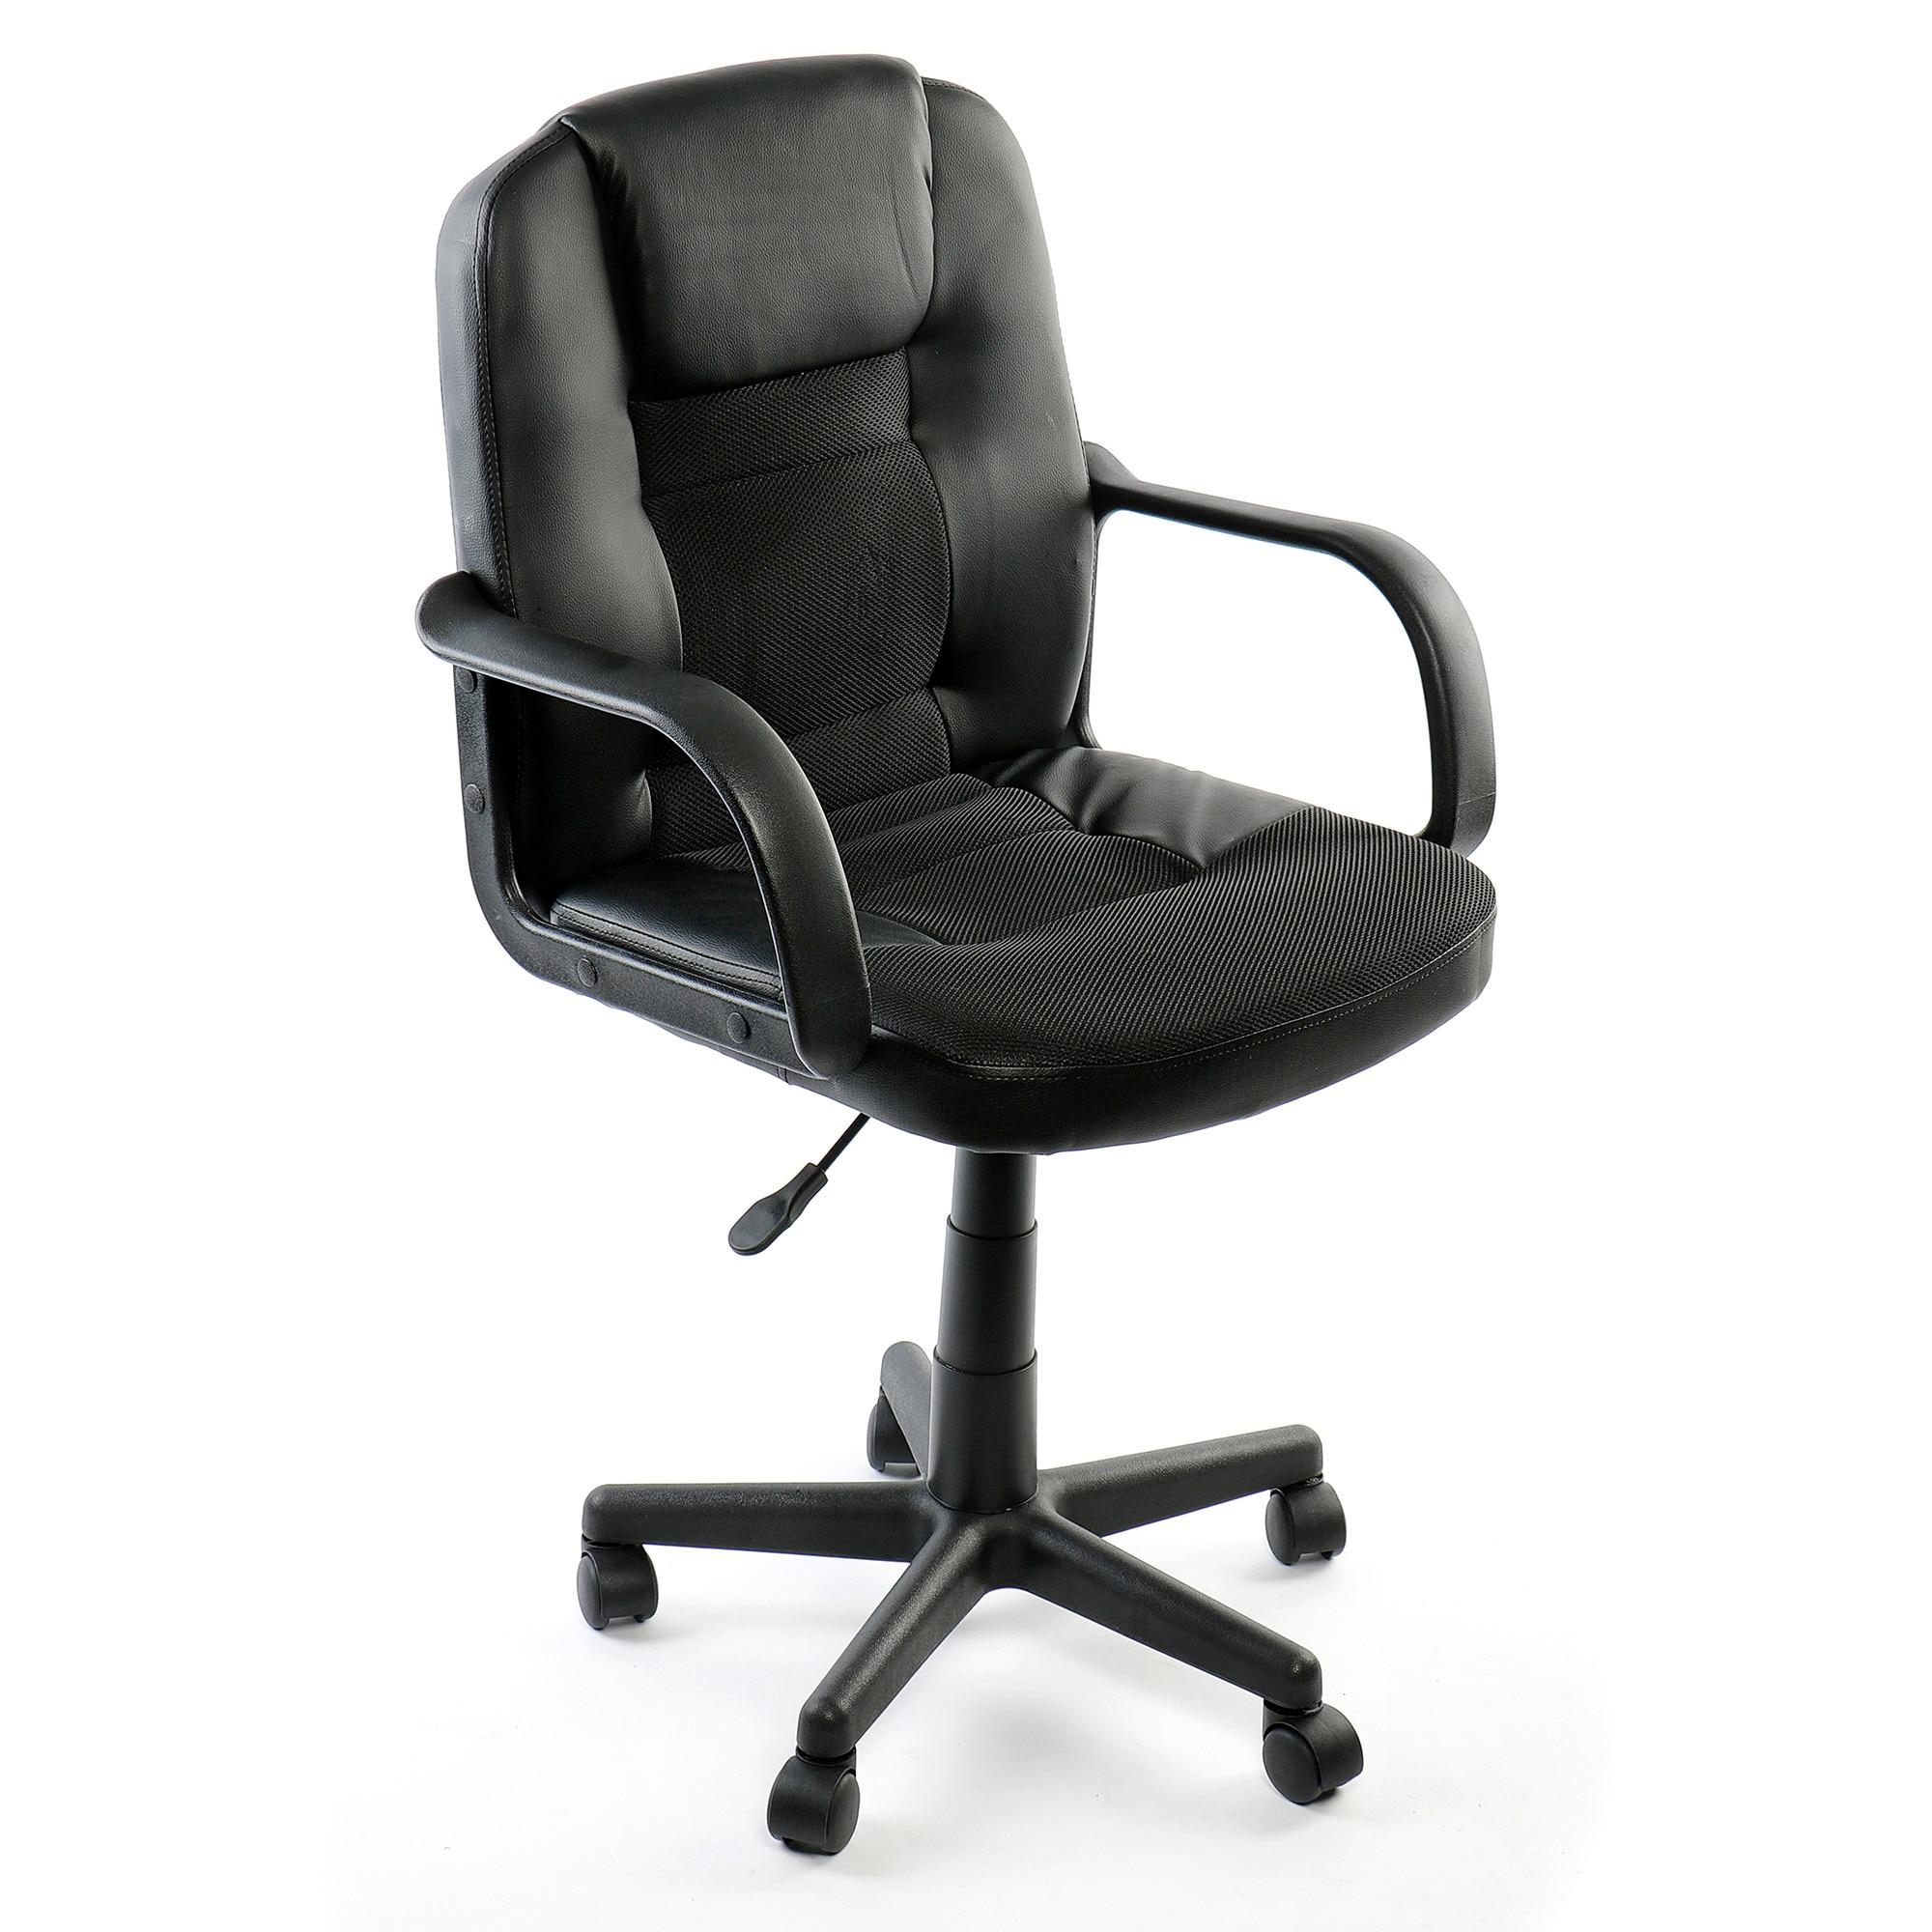 100.000 forintos gerinckímélő irodai székek